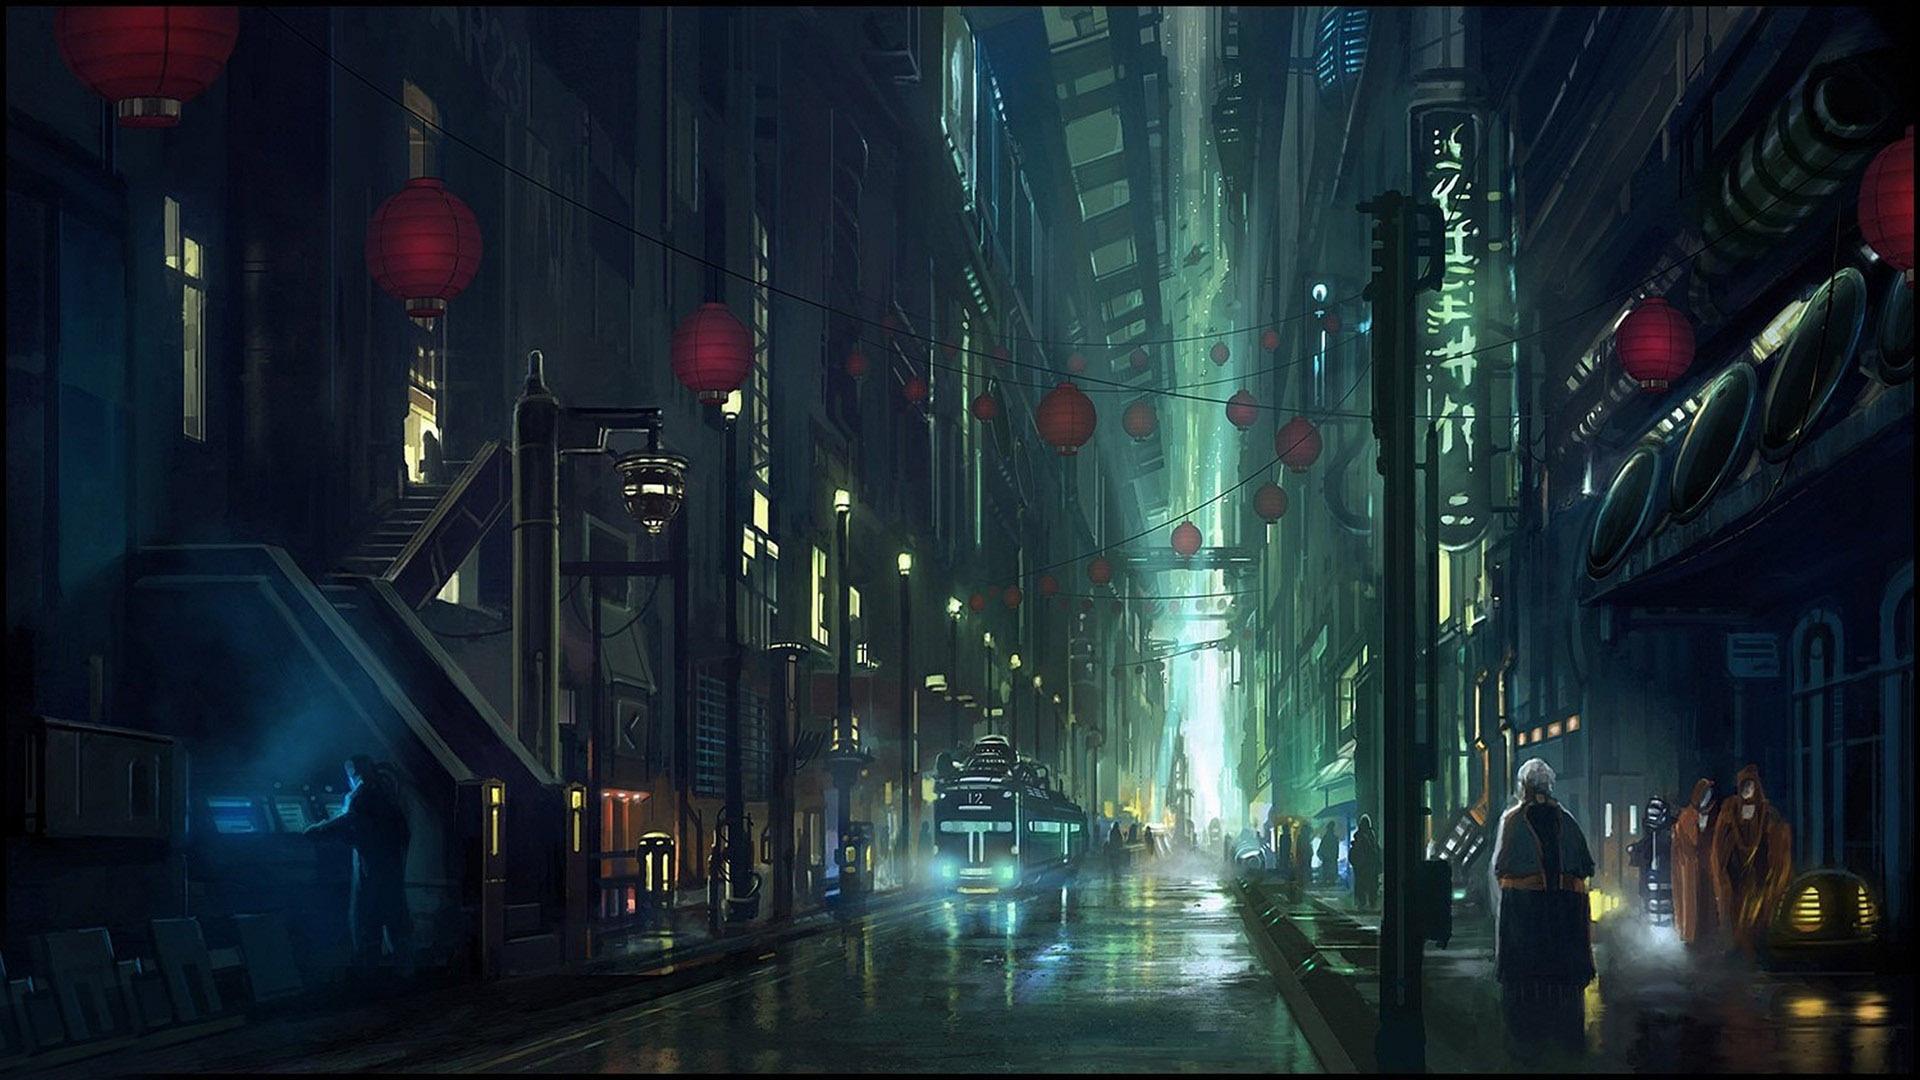 Free Download Cyberpunk City Street Wallpaper 14731